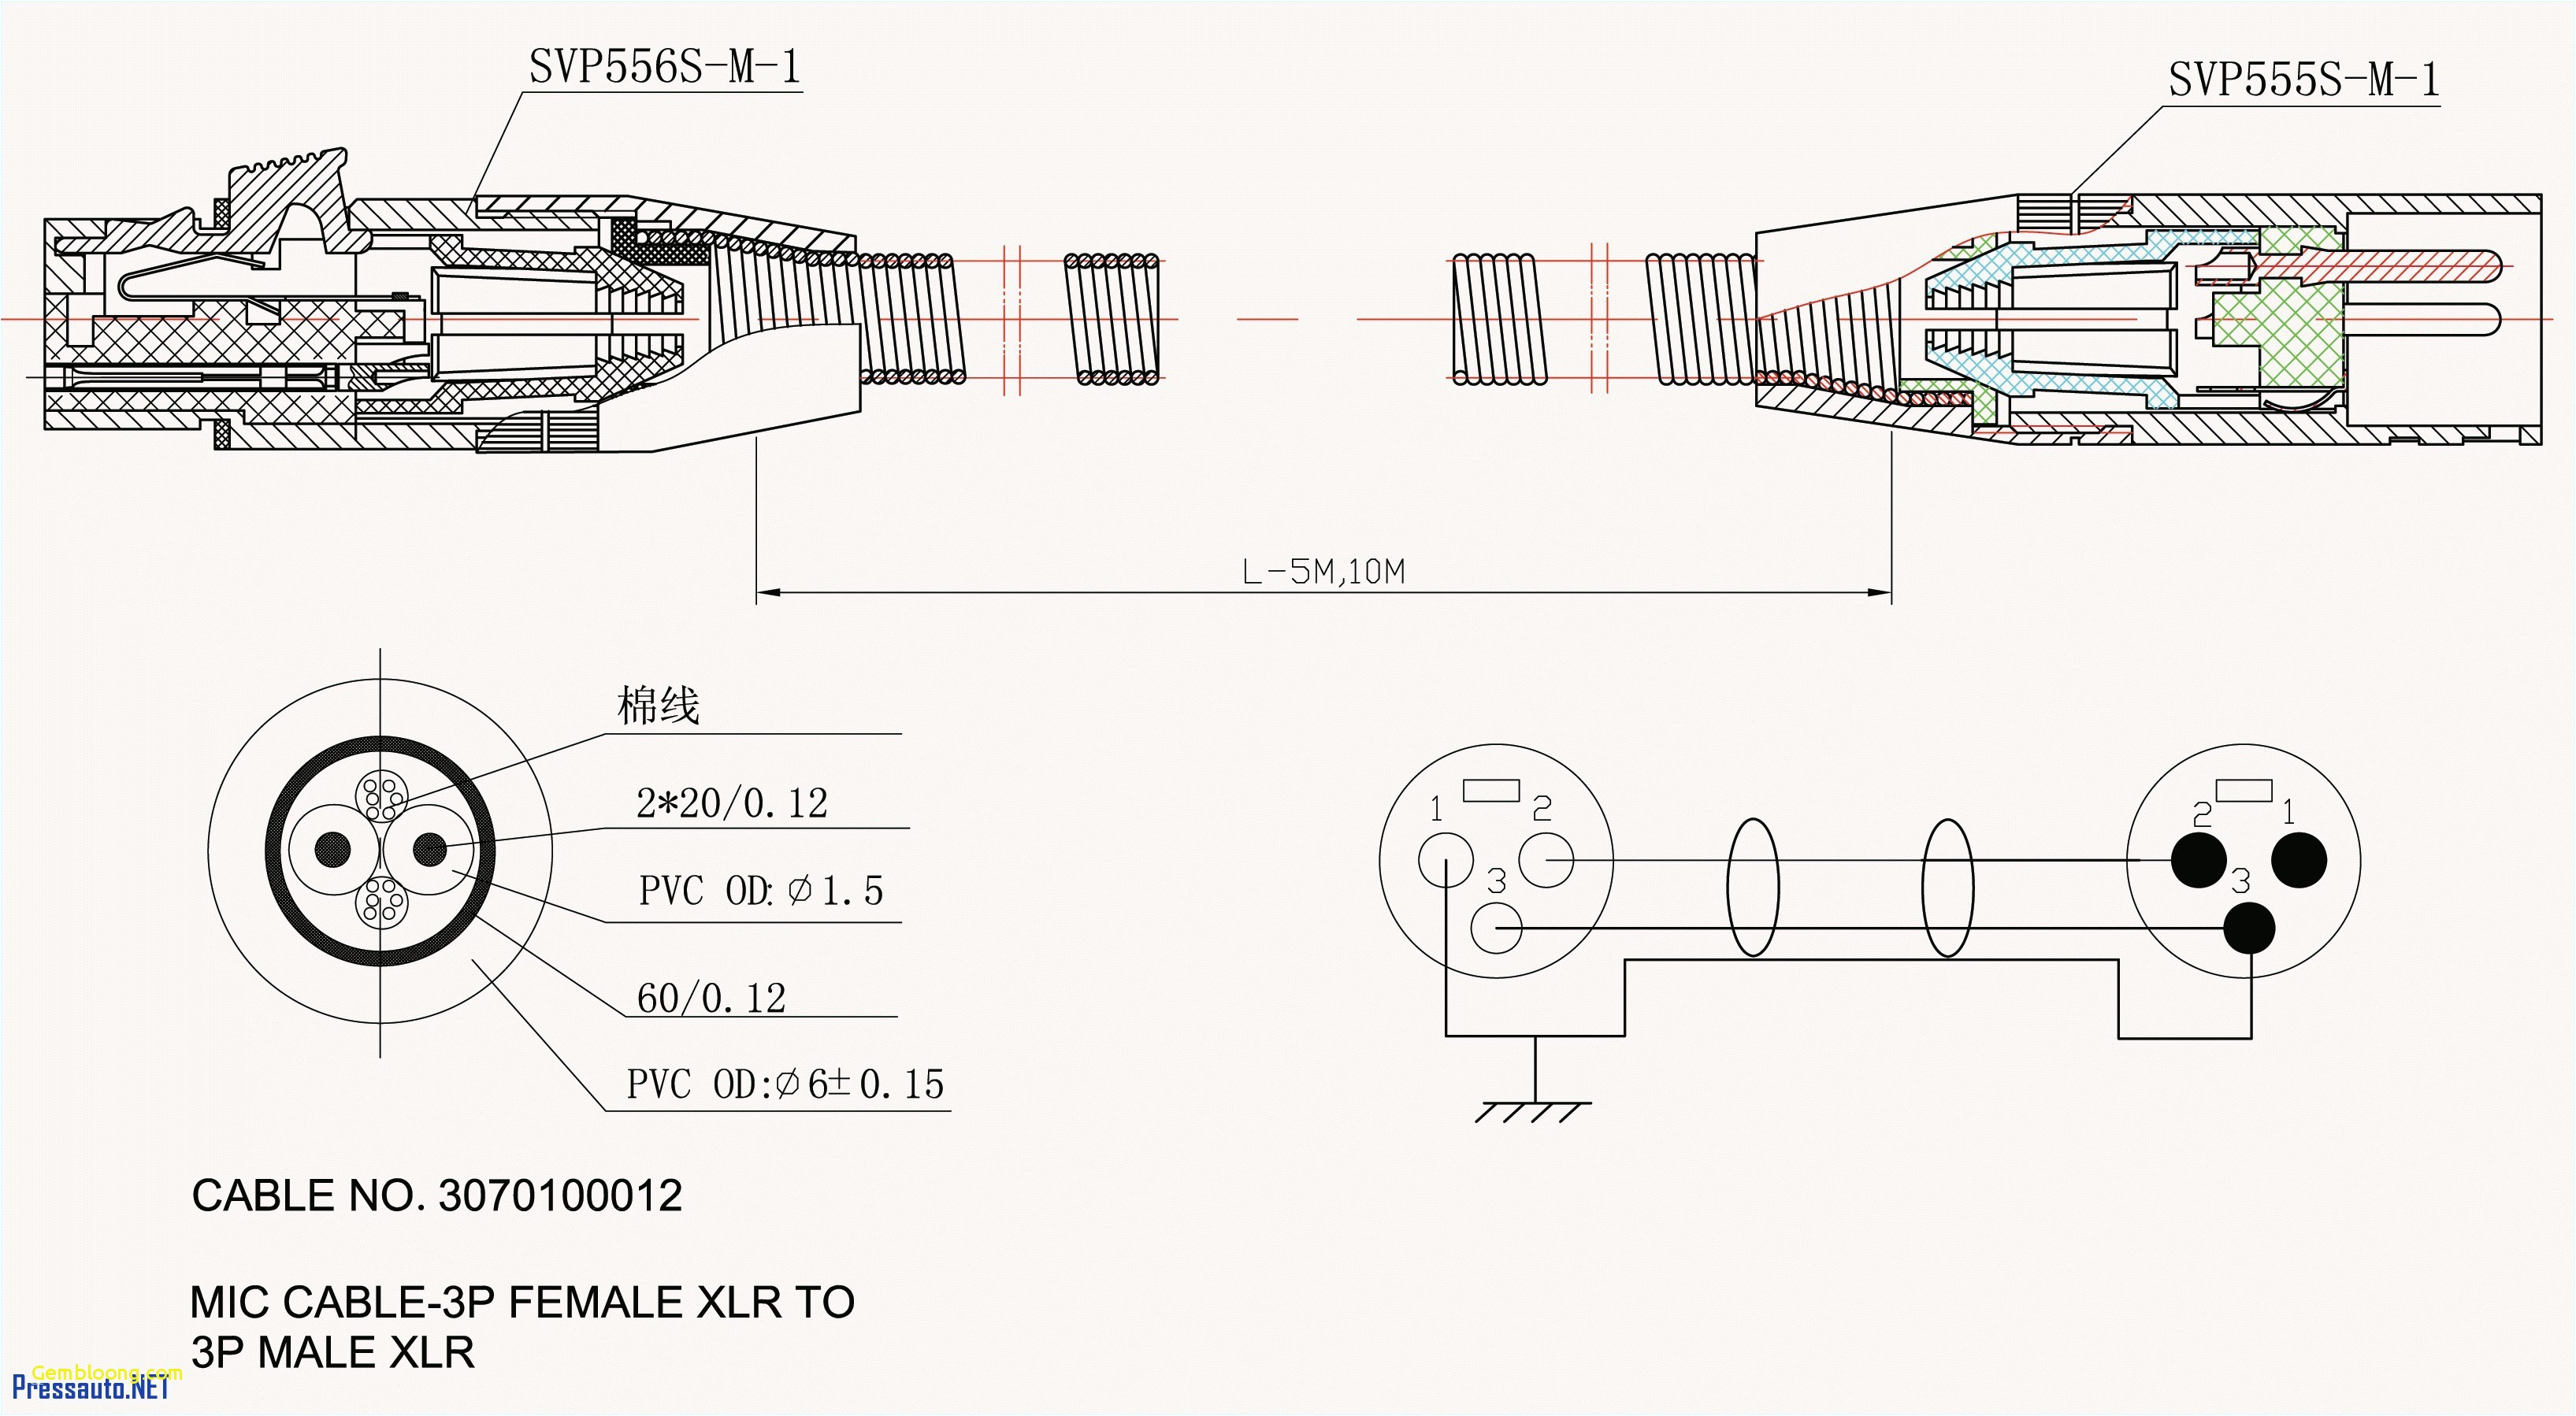 e15 wiring diagrams wiring diagram repair guides bmw e15 wiring diagrams